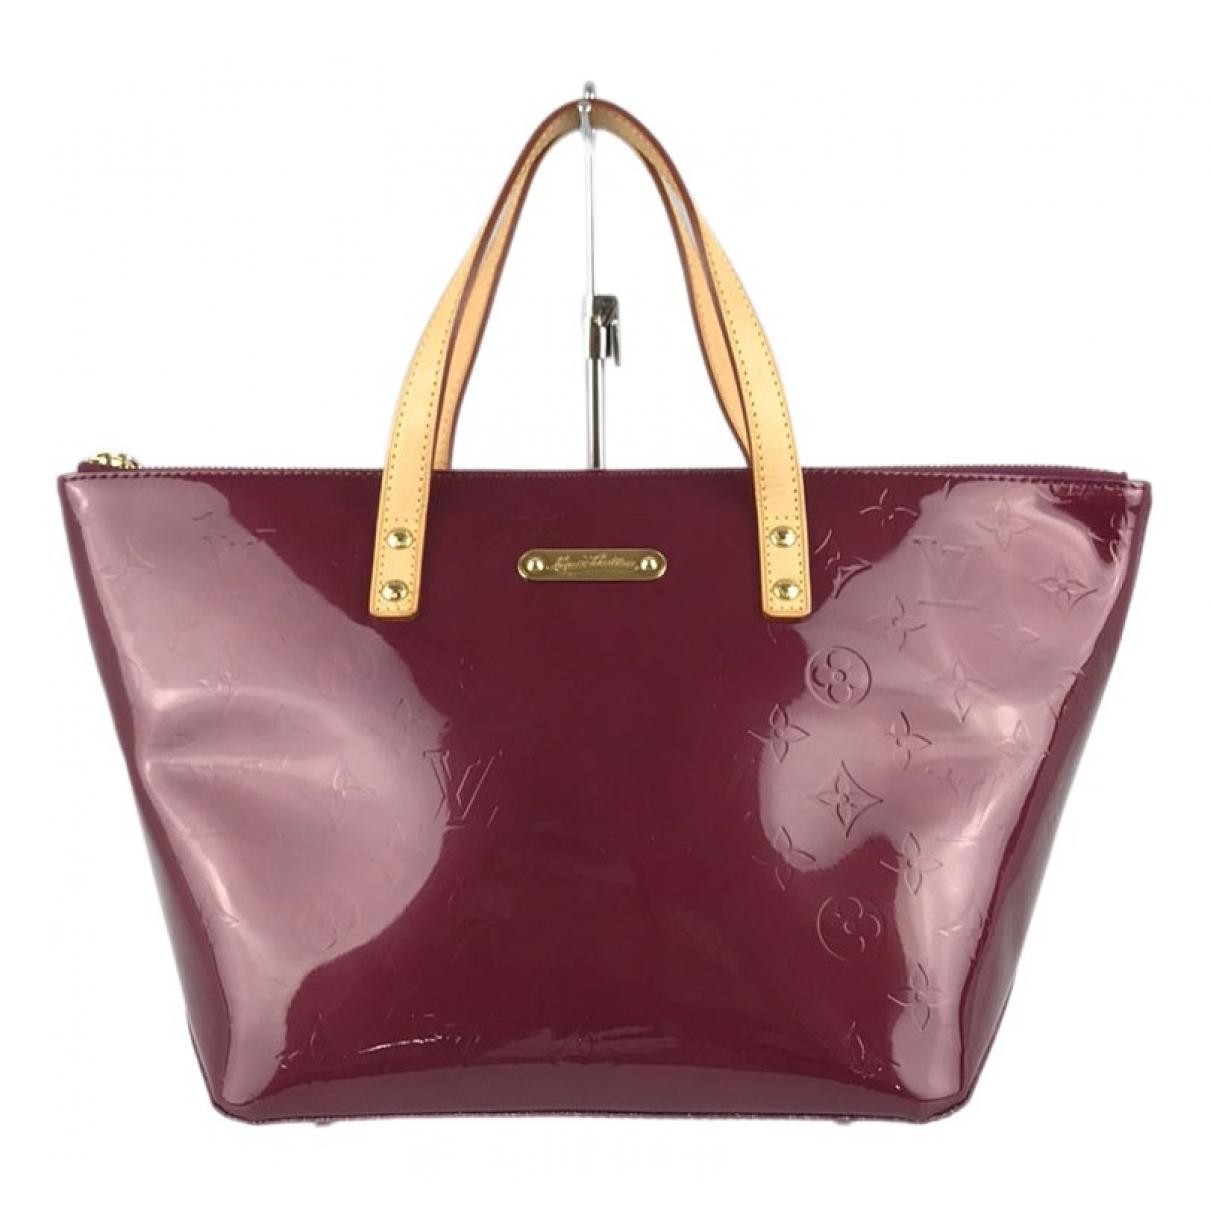 Louis Vuitton Bellevue Red Patent leather handbag for Women \N